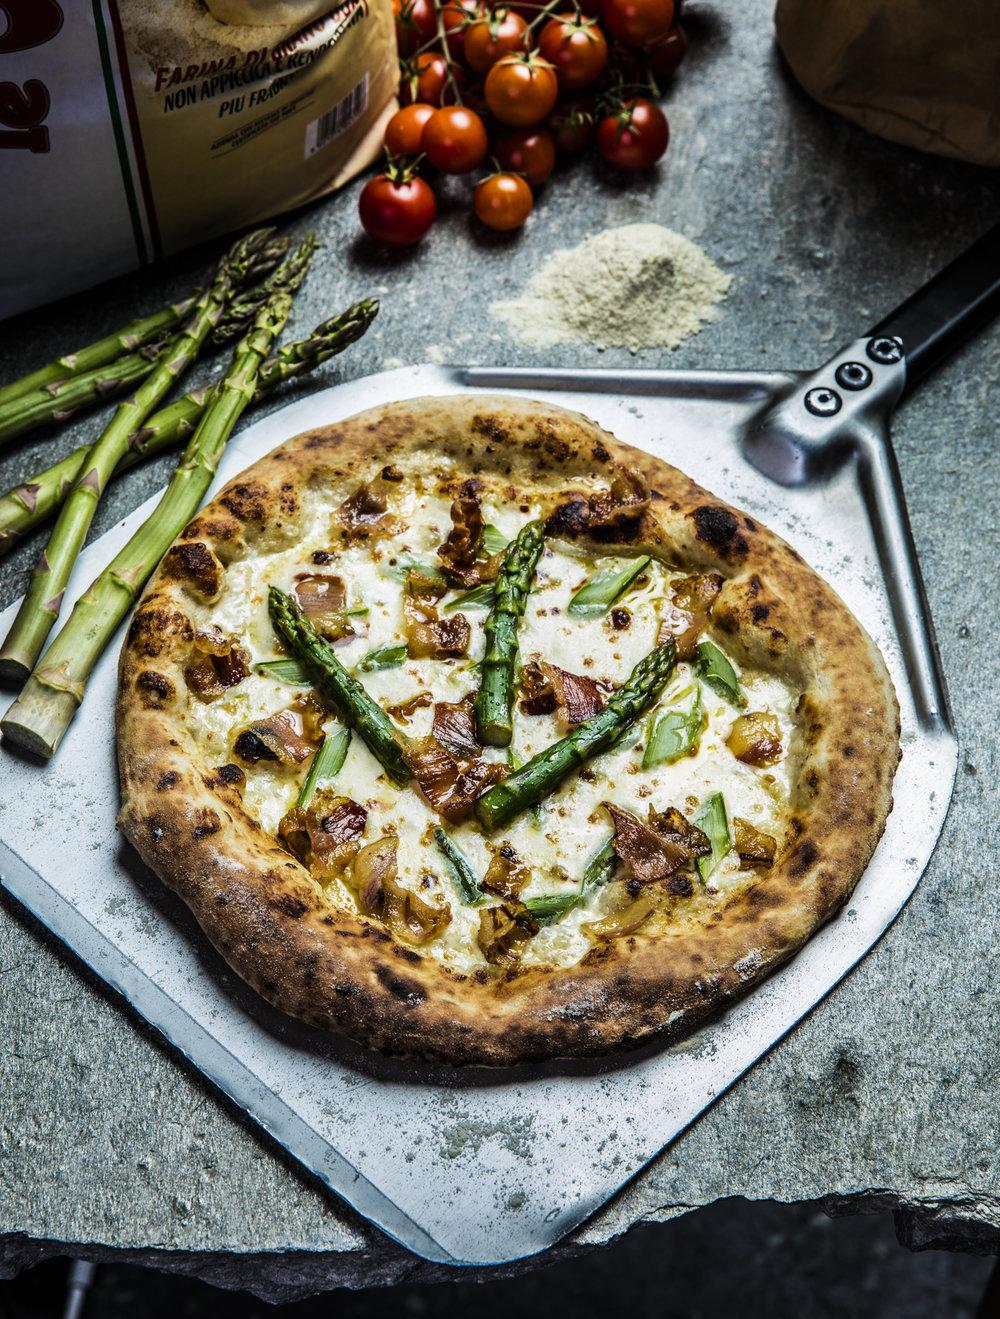 paleet-pizza-vår-7376.jpg